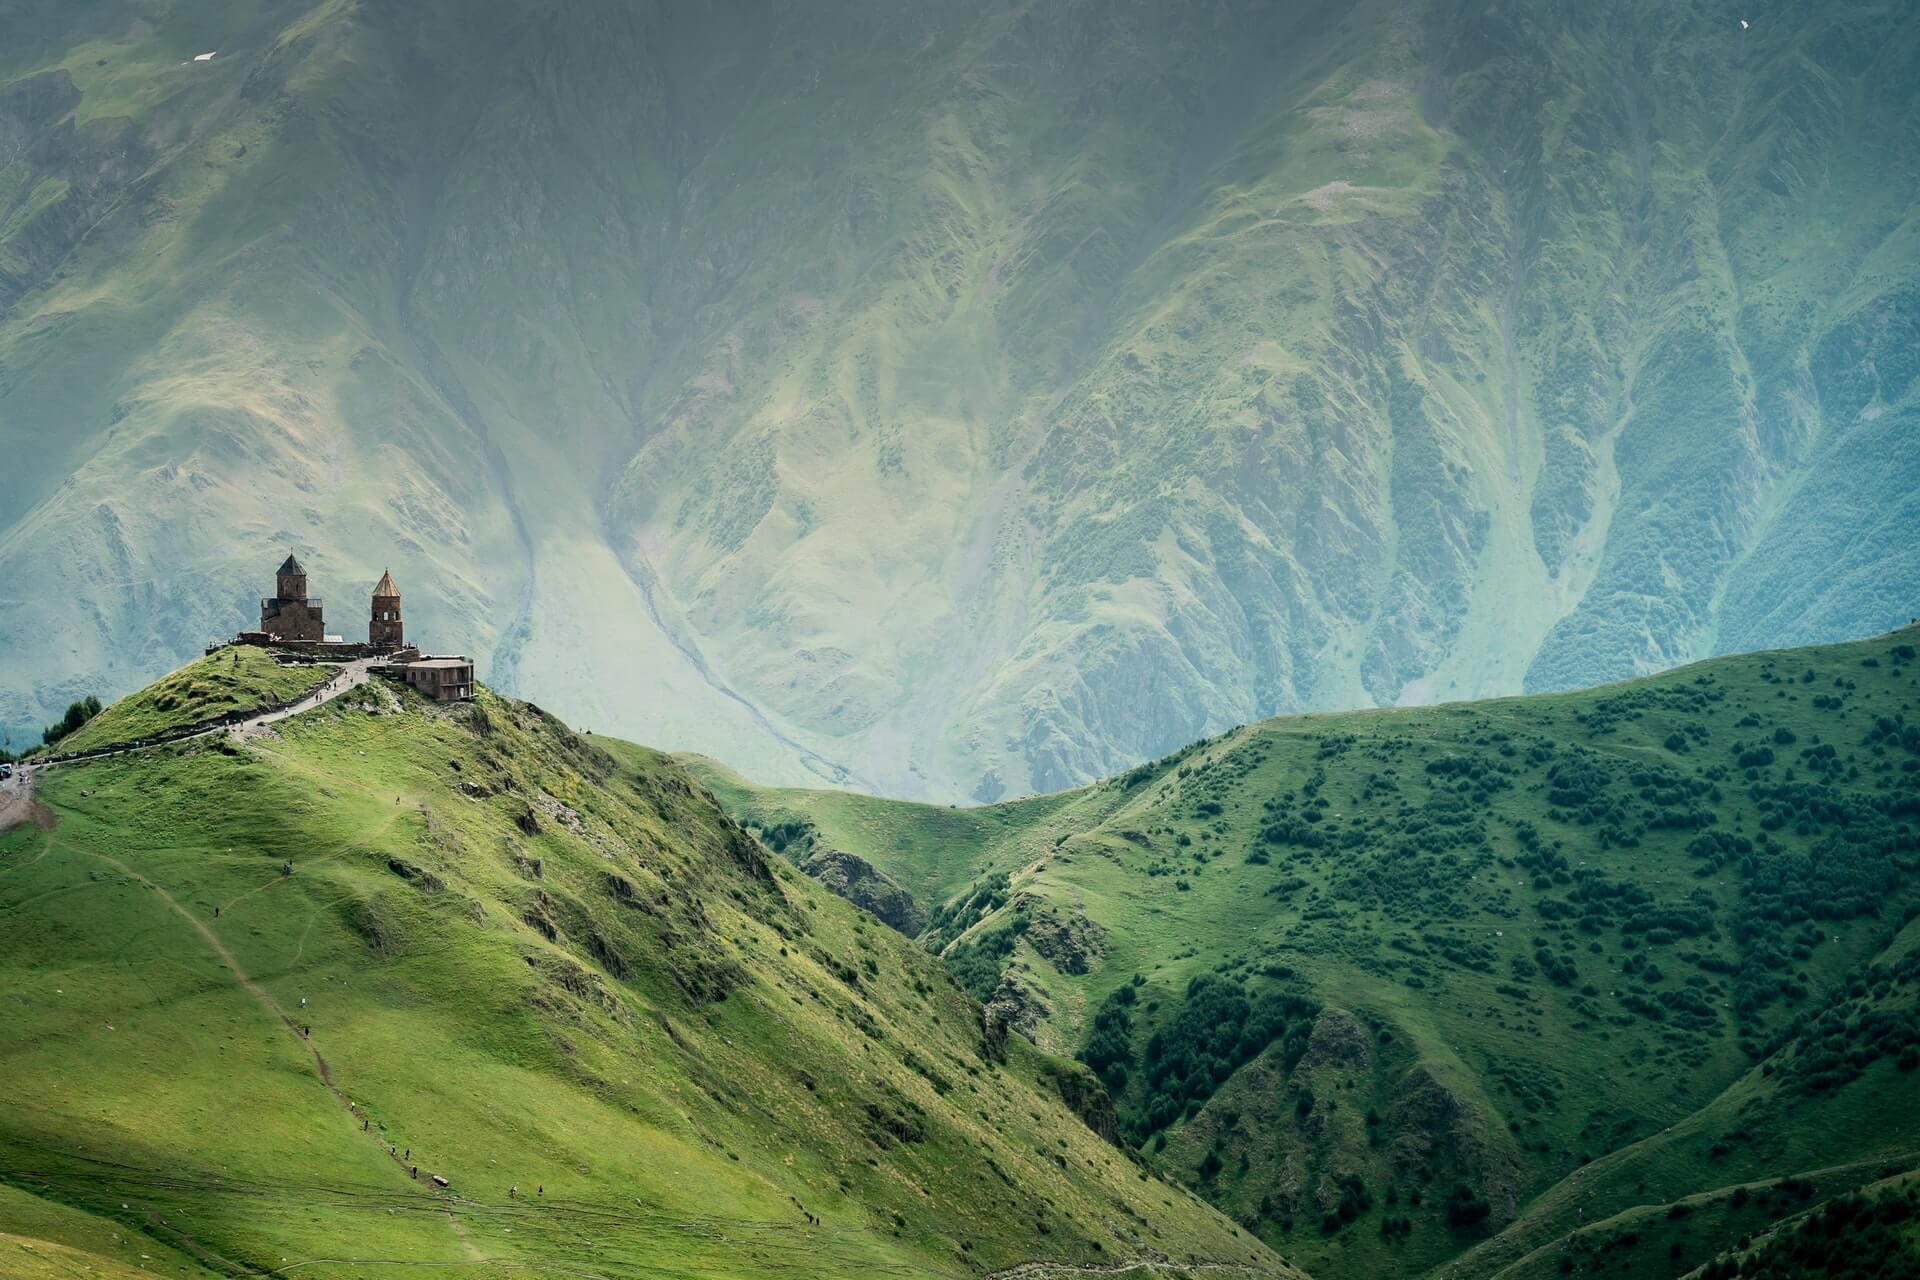 Landscape in Georgia - best off the beaten path destination near Europe